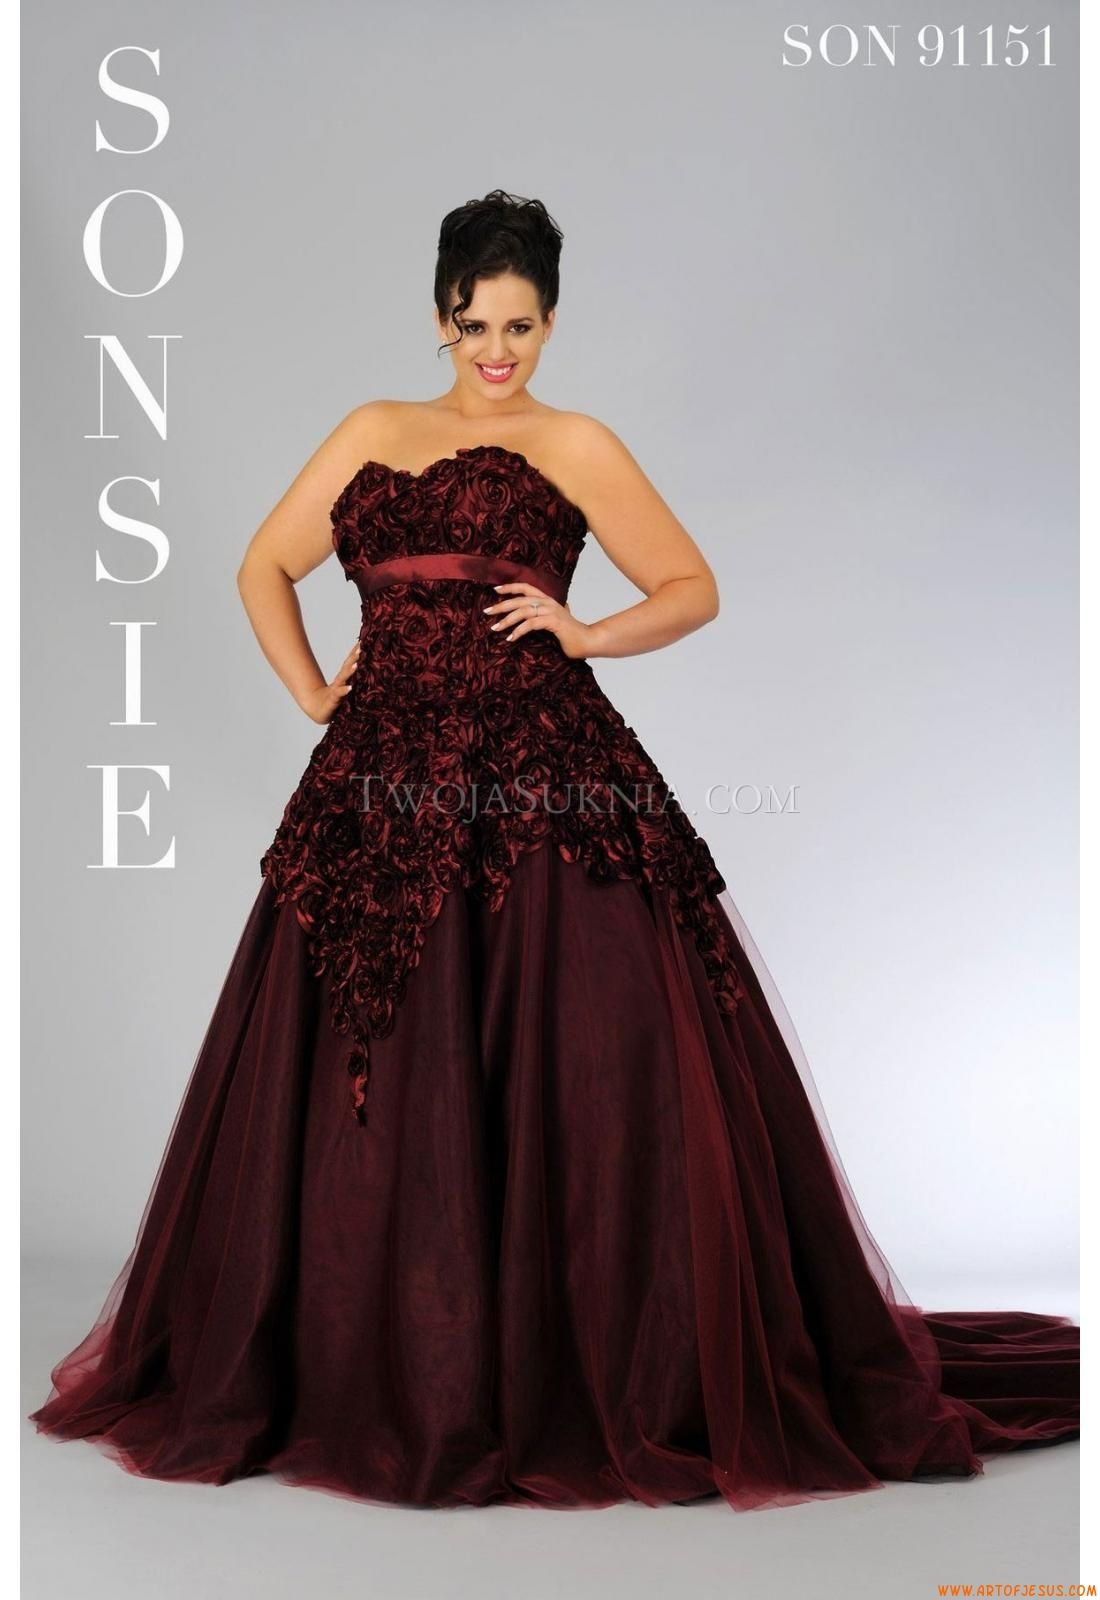 Wedding dresses veromia son sonsie plus size wedding dresses